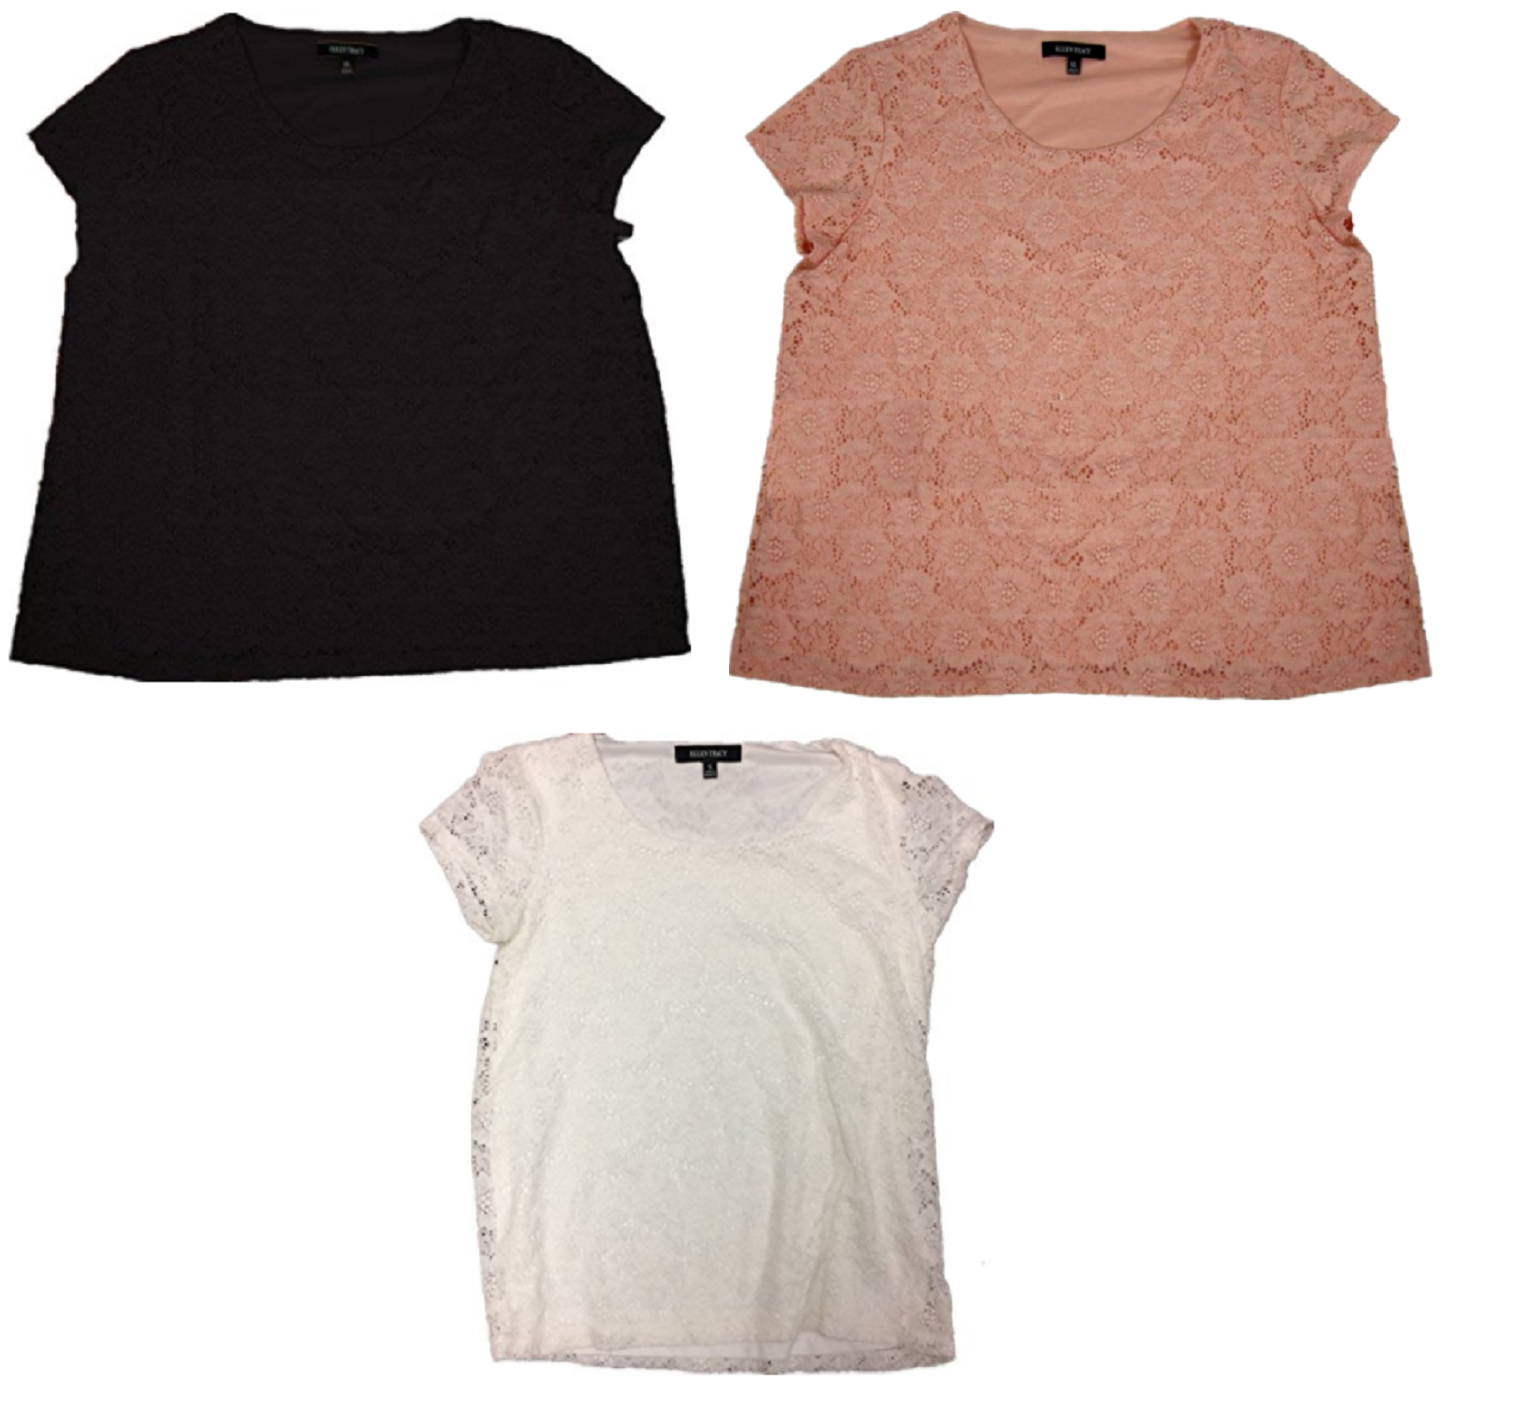 Ellen Tracy Women s Lace Detail Overlay Short Sleeve Top - $8.50